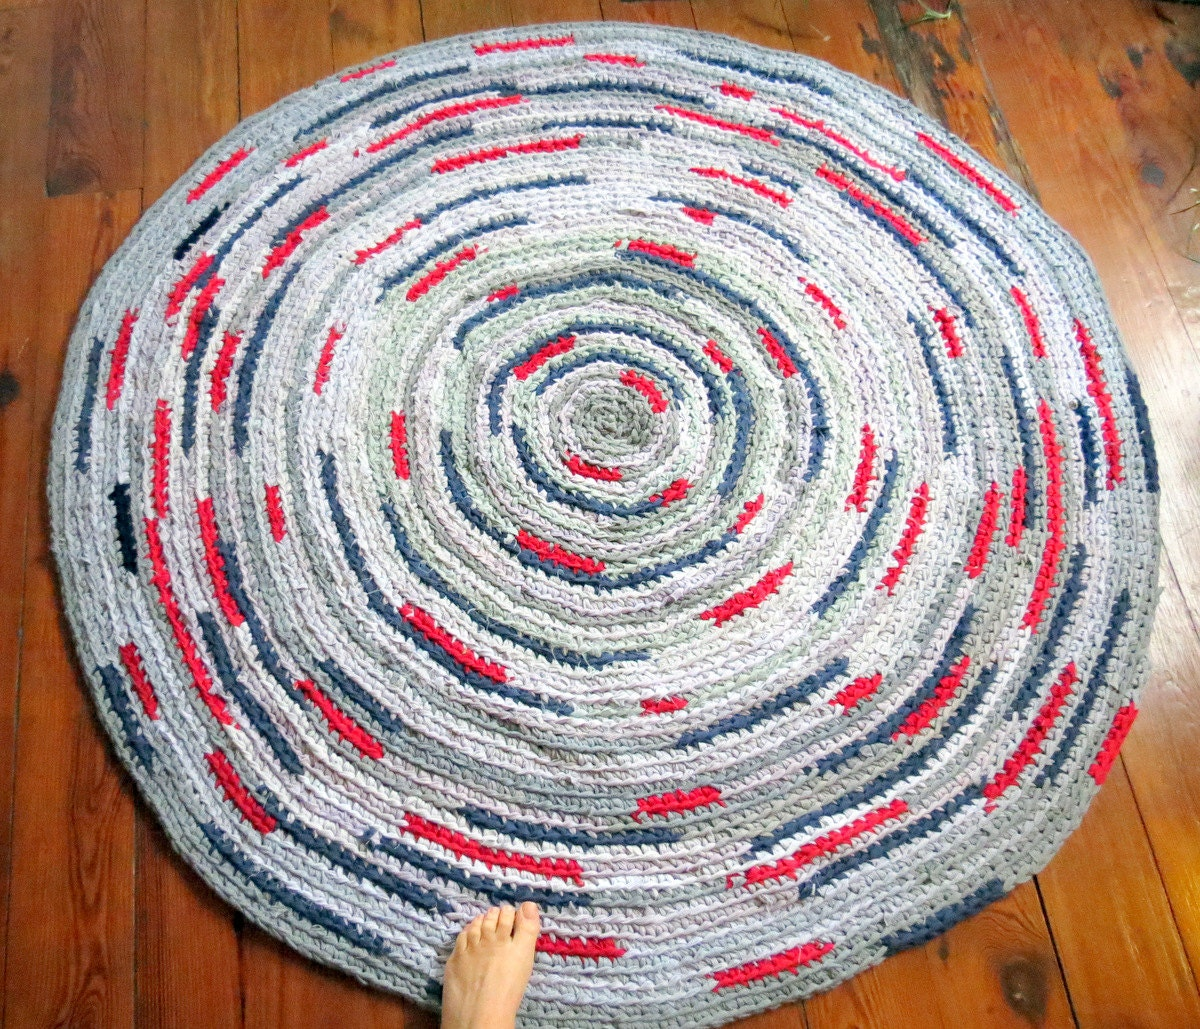 Rug Rag Rug Handmade Crochet Rug Round Rug